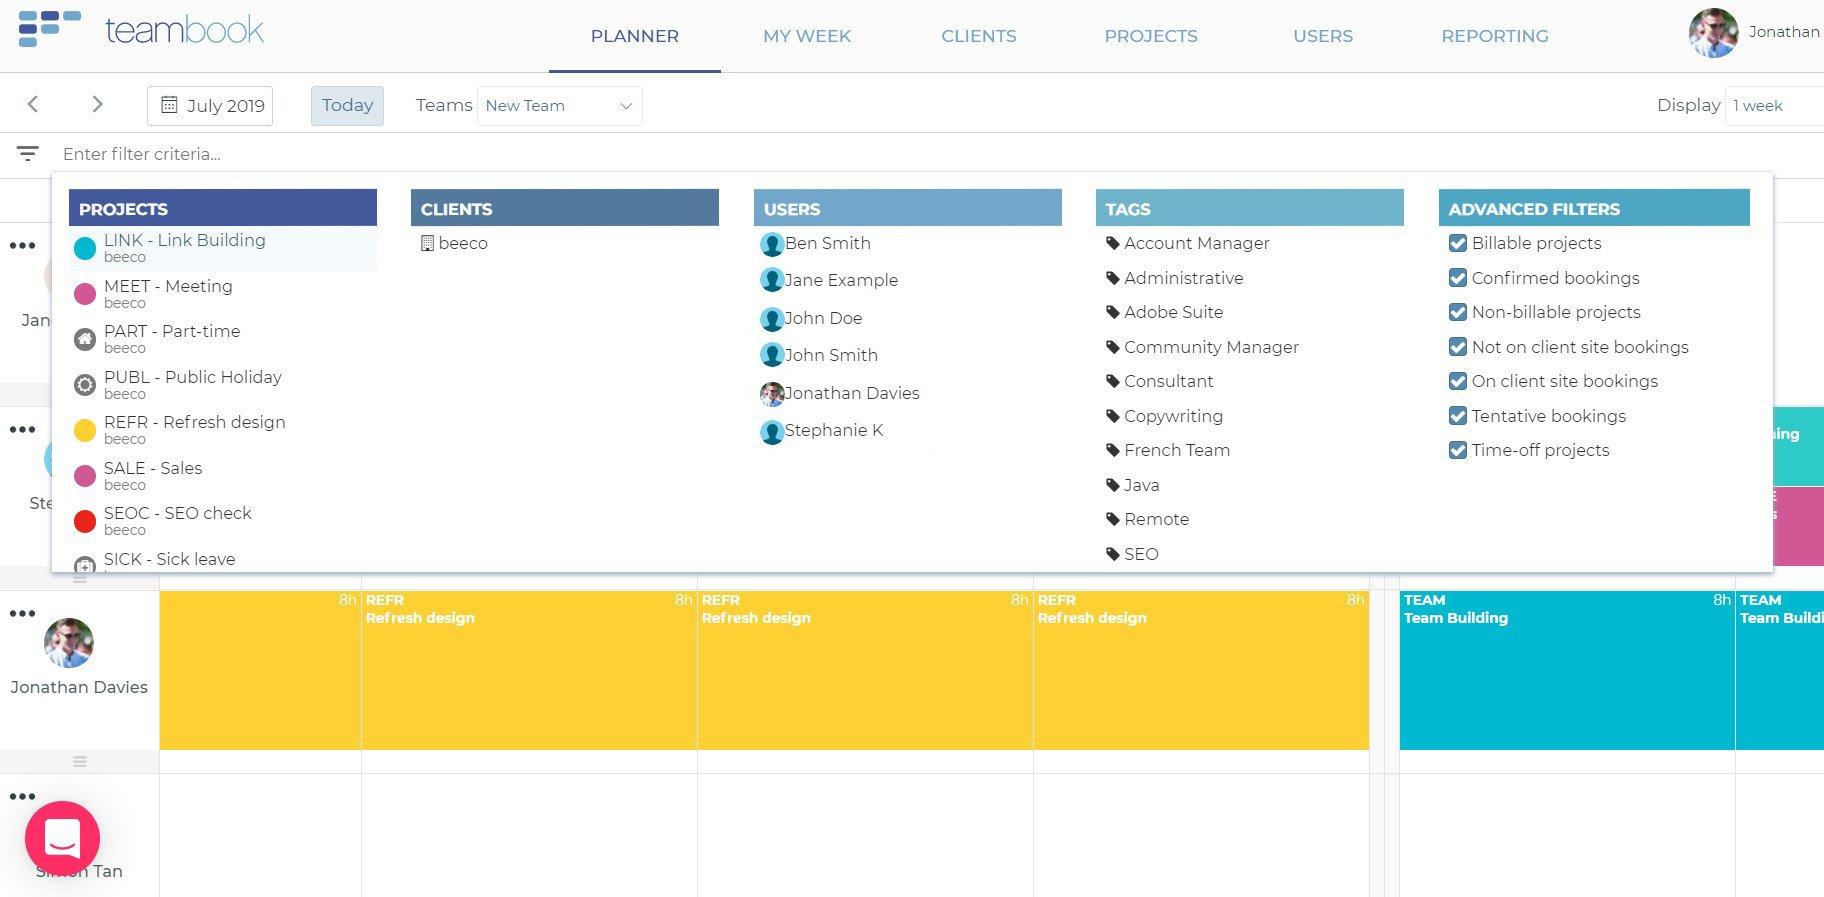 teambook-filters